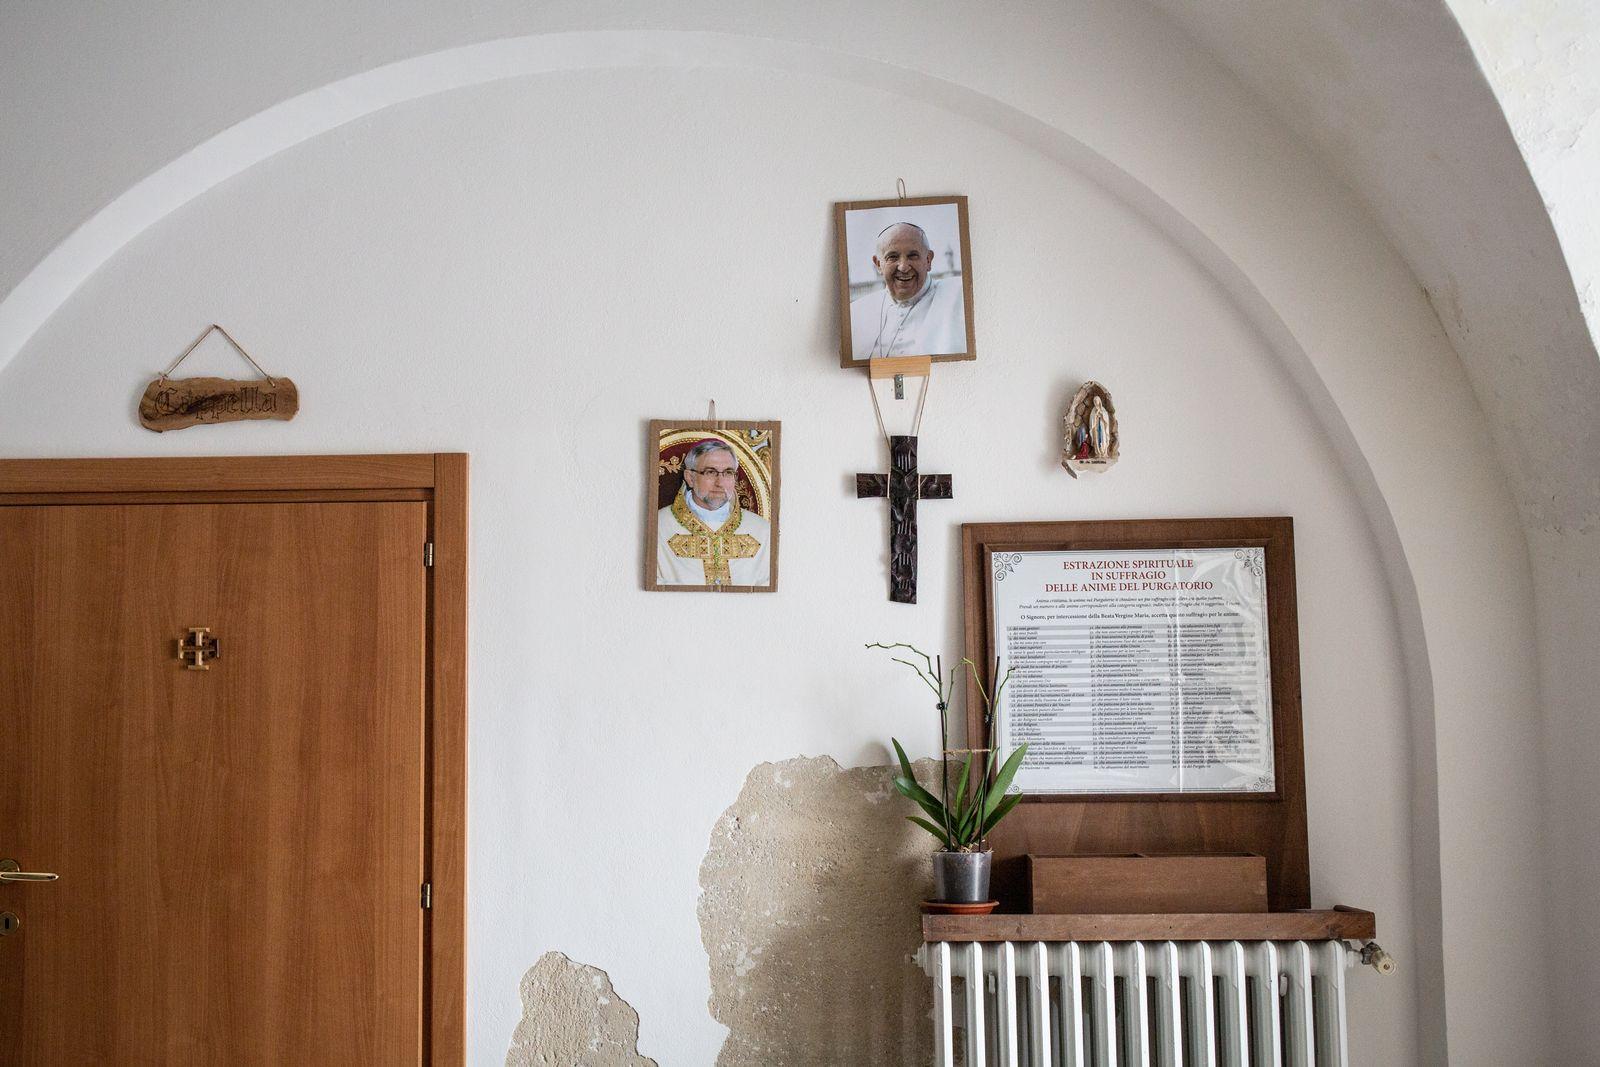 Italien/ Prostitution/ Nonnen